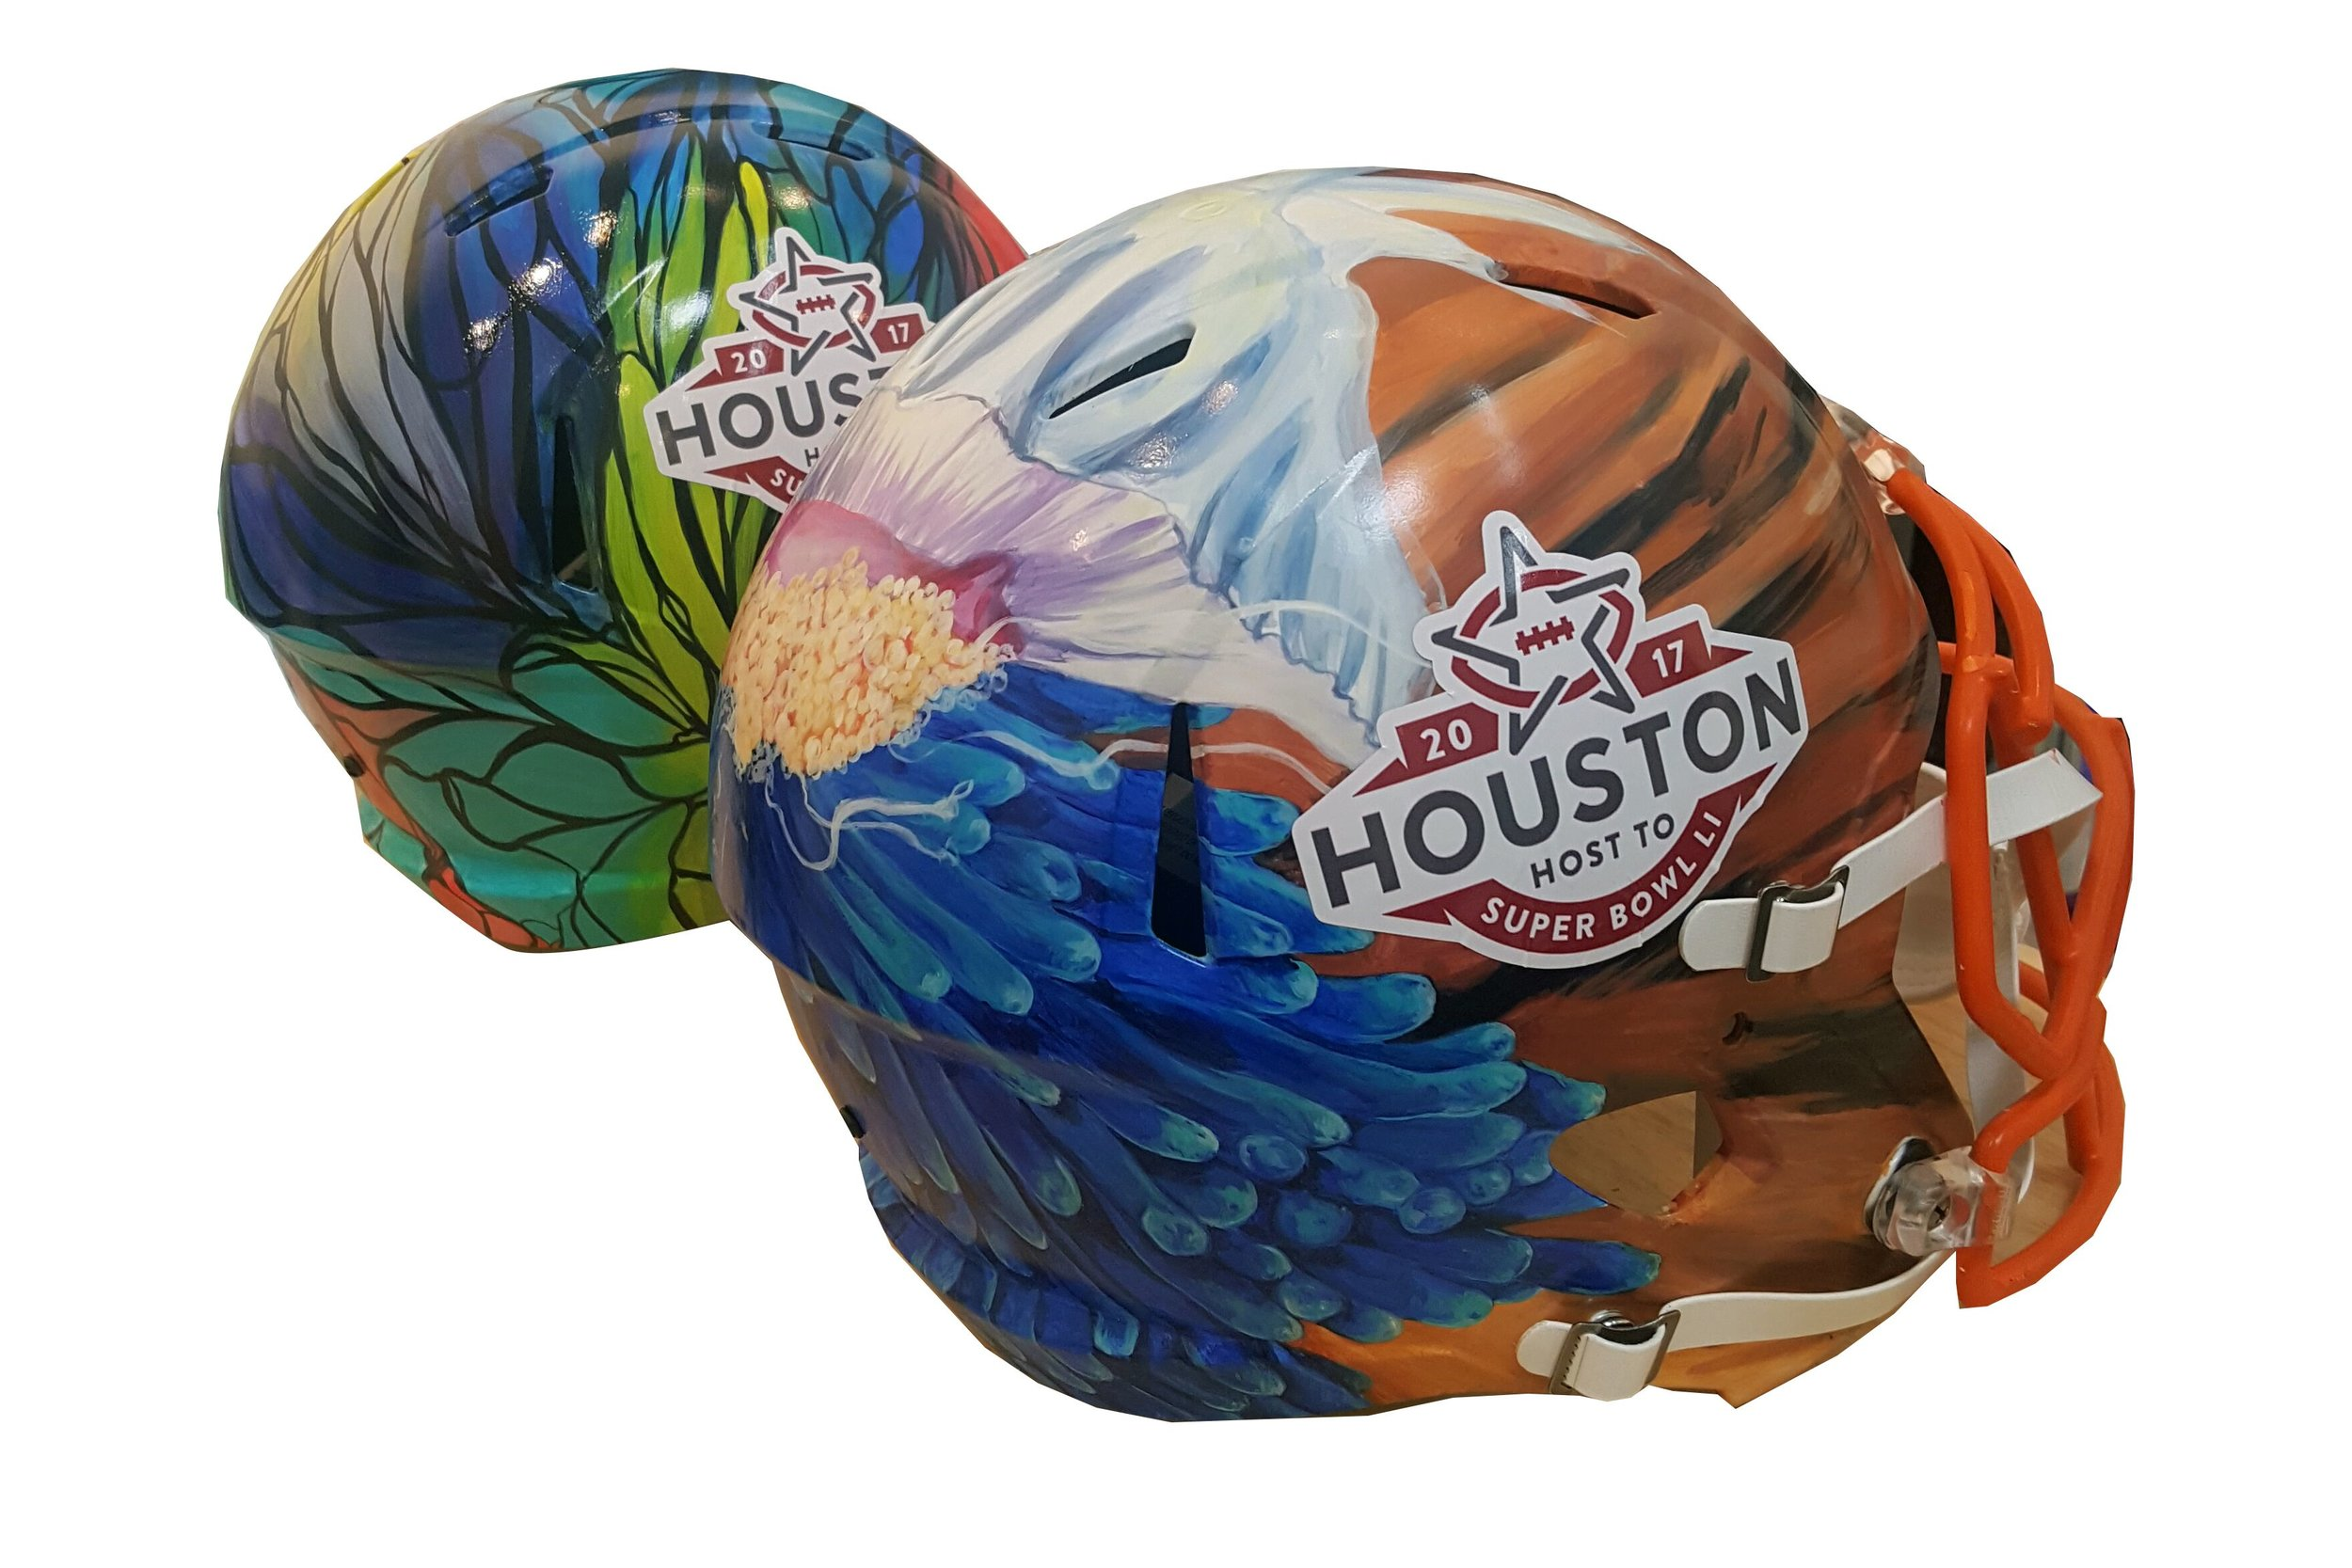 Two Super Bowl Helmet